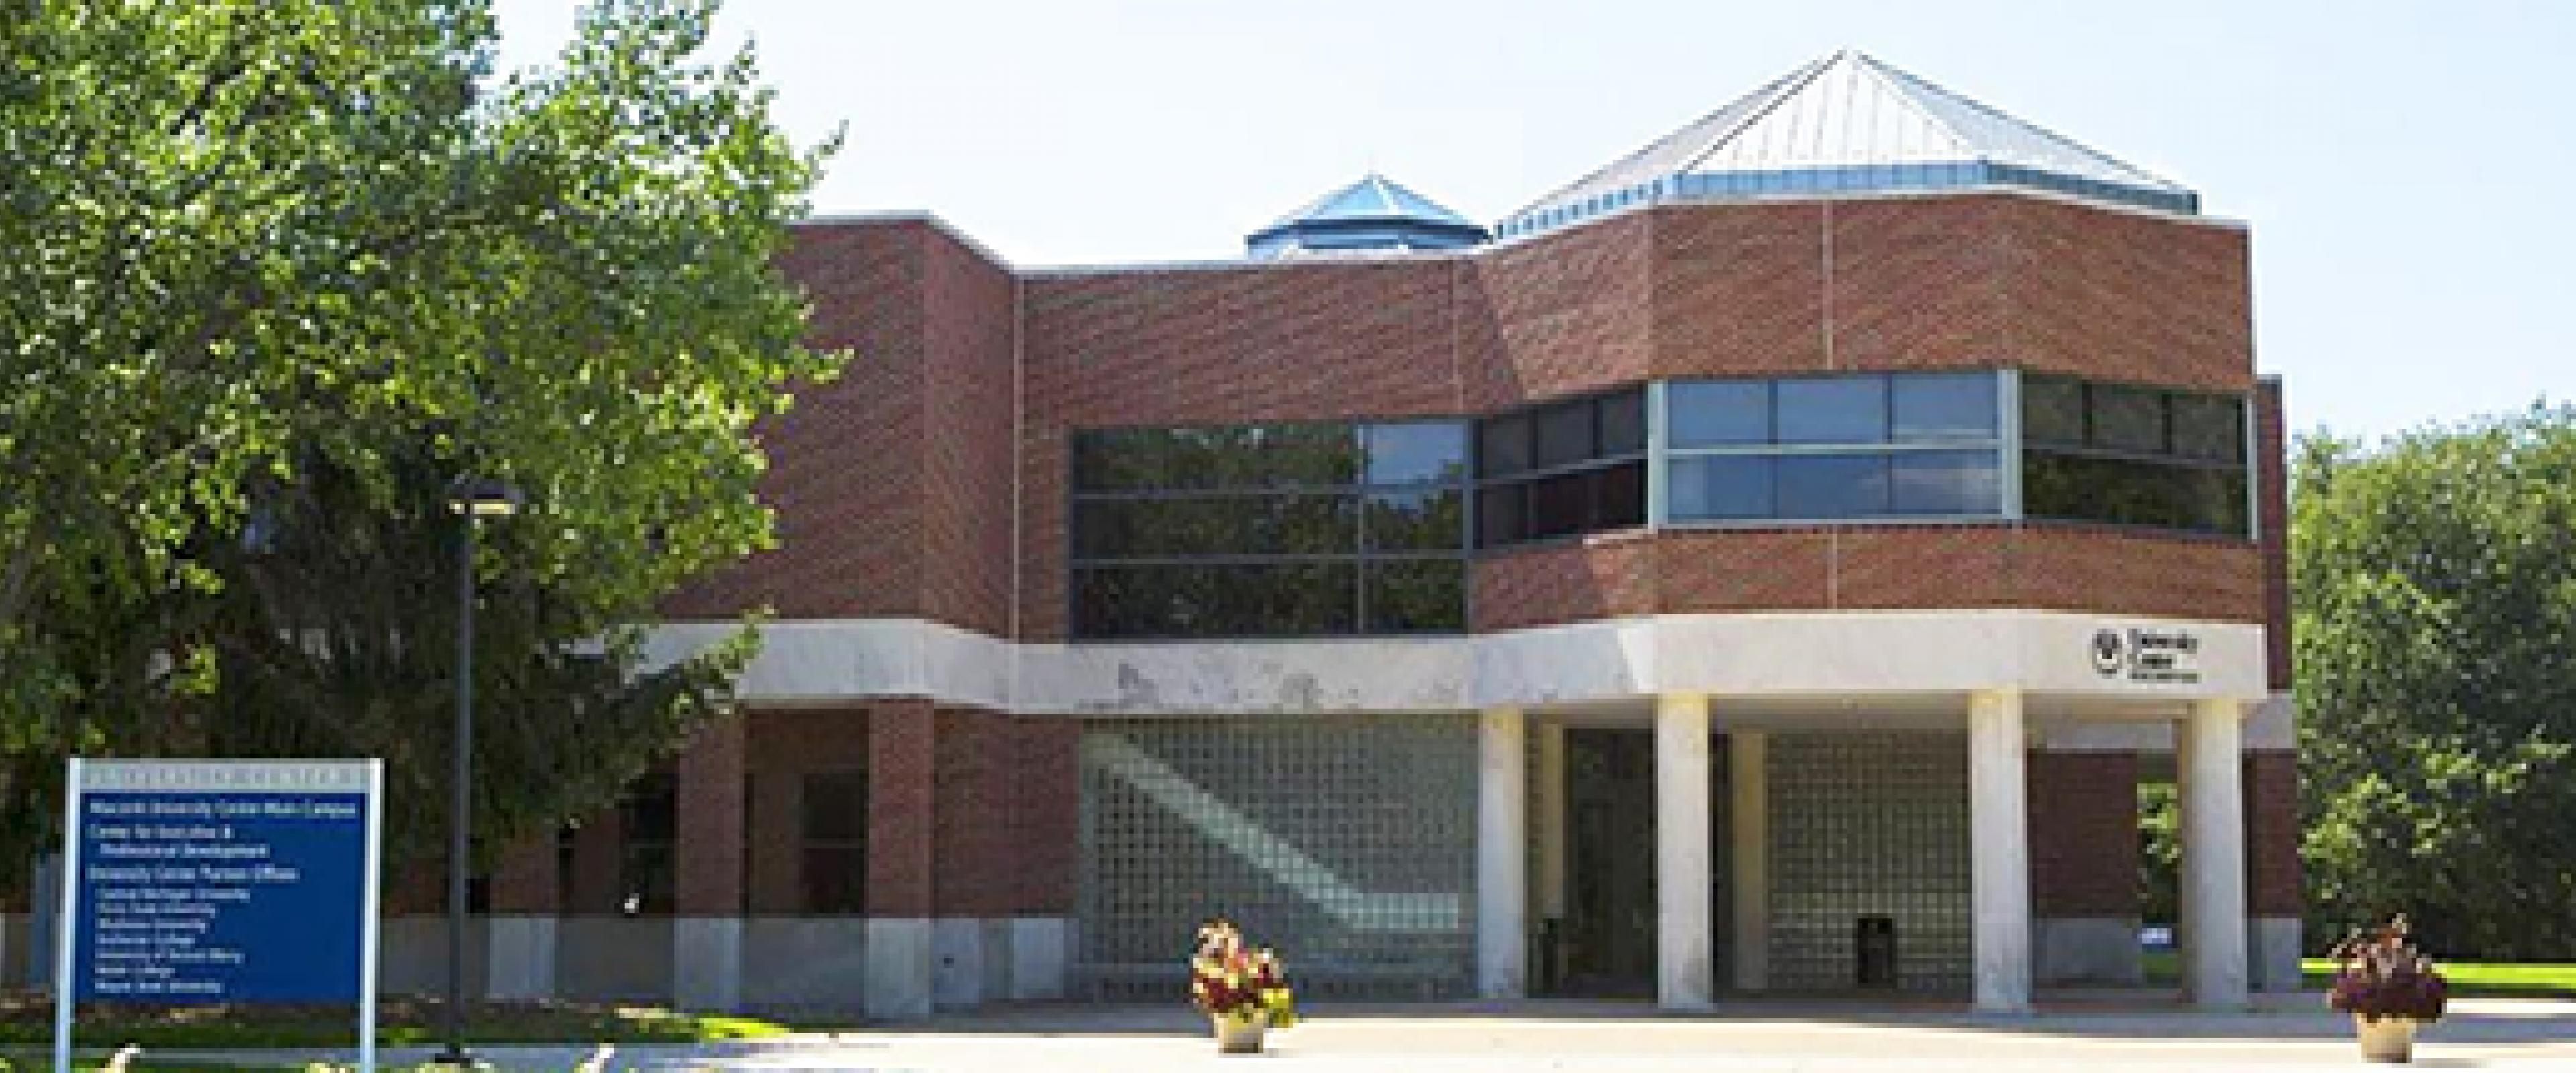 WMU-Metro Detroit location